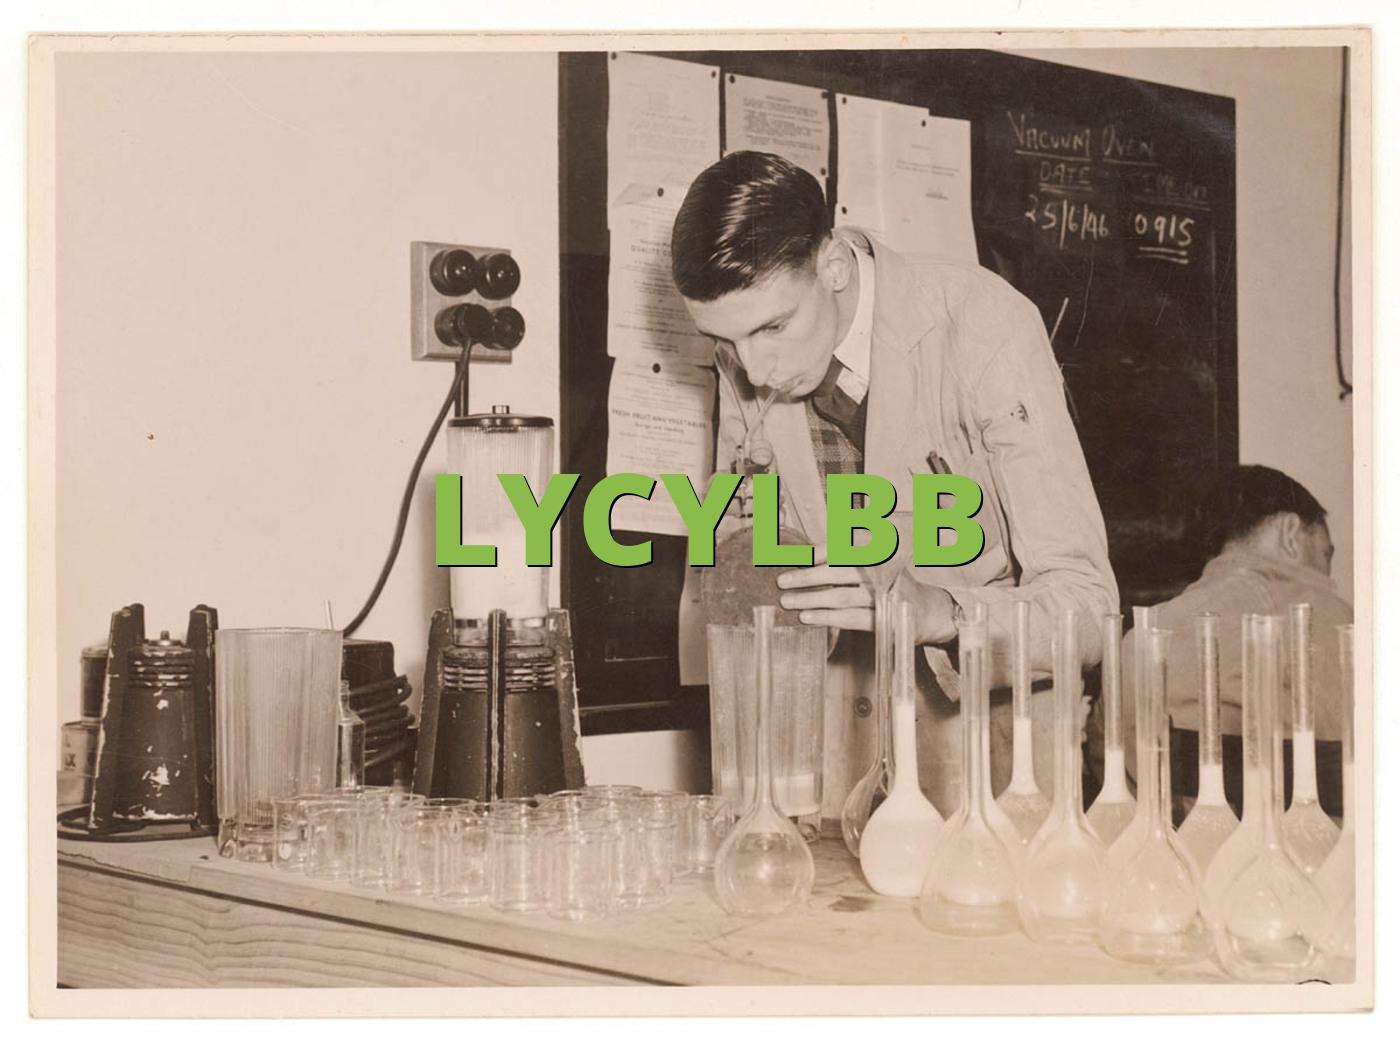 LYCYLBB